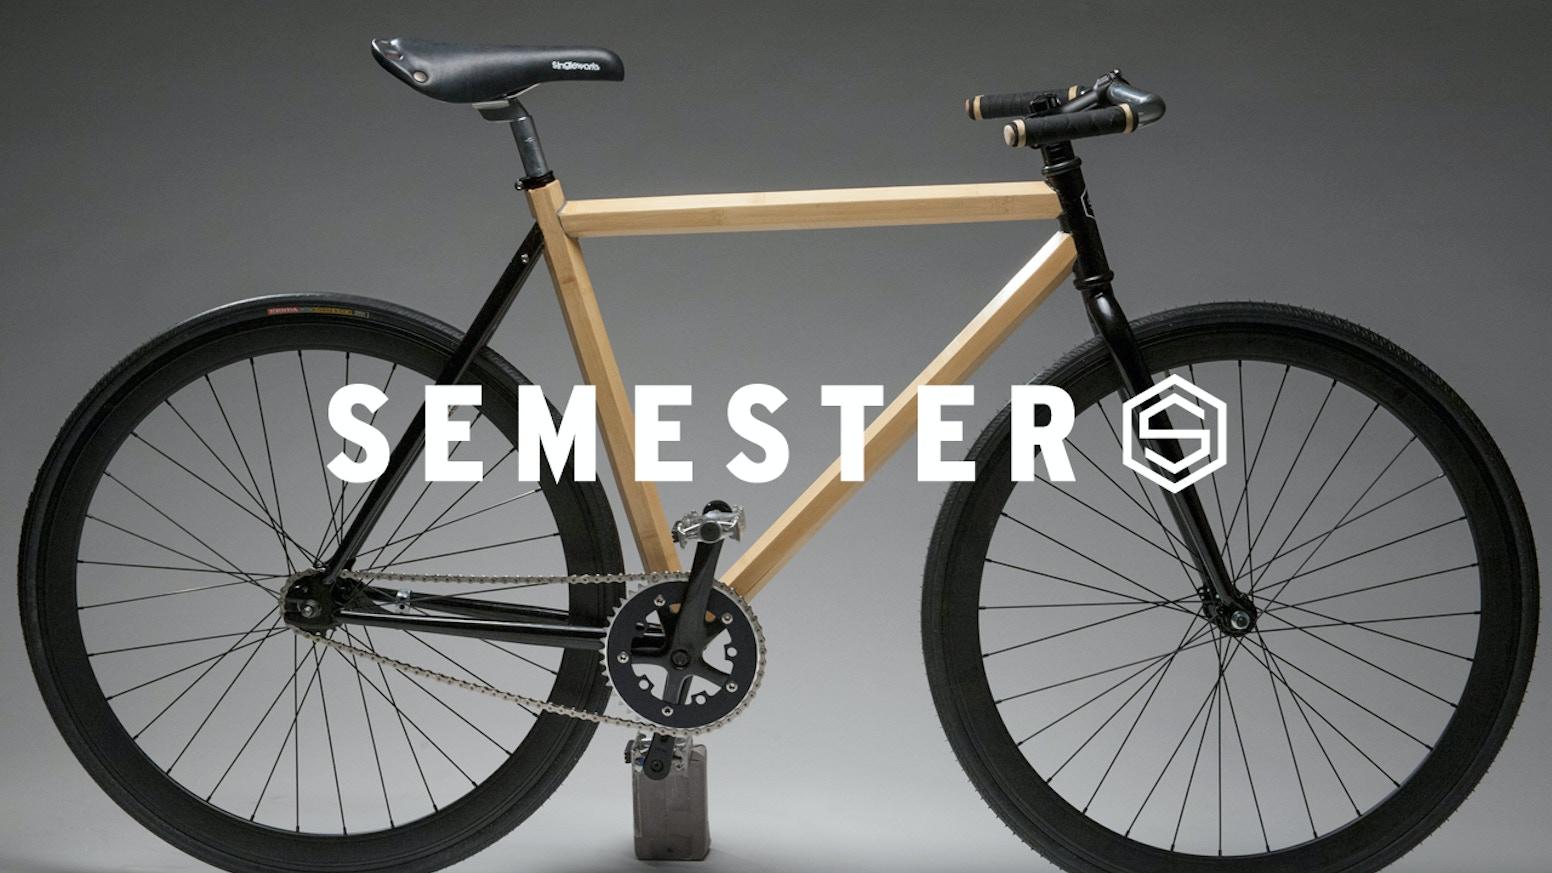 Semester Bicycle: HexTube Bamboo + Carbon Fiber Bike by Pamela Dorr ...